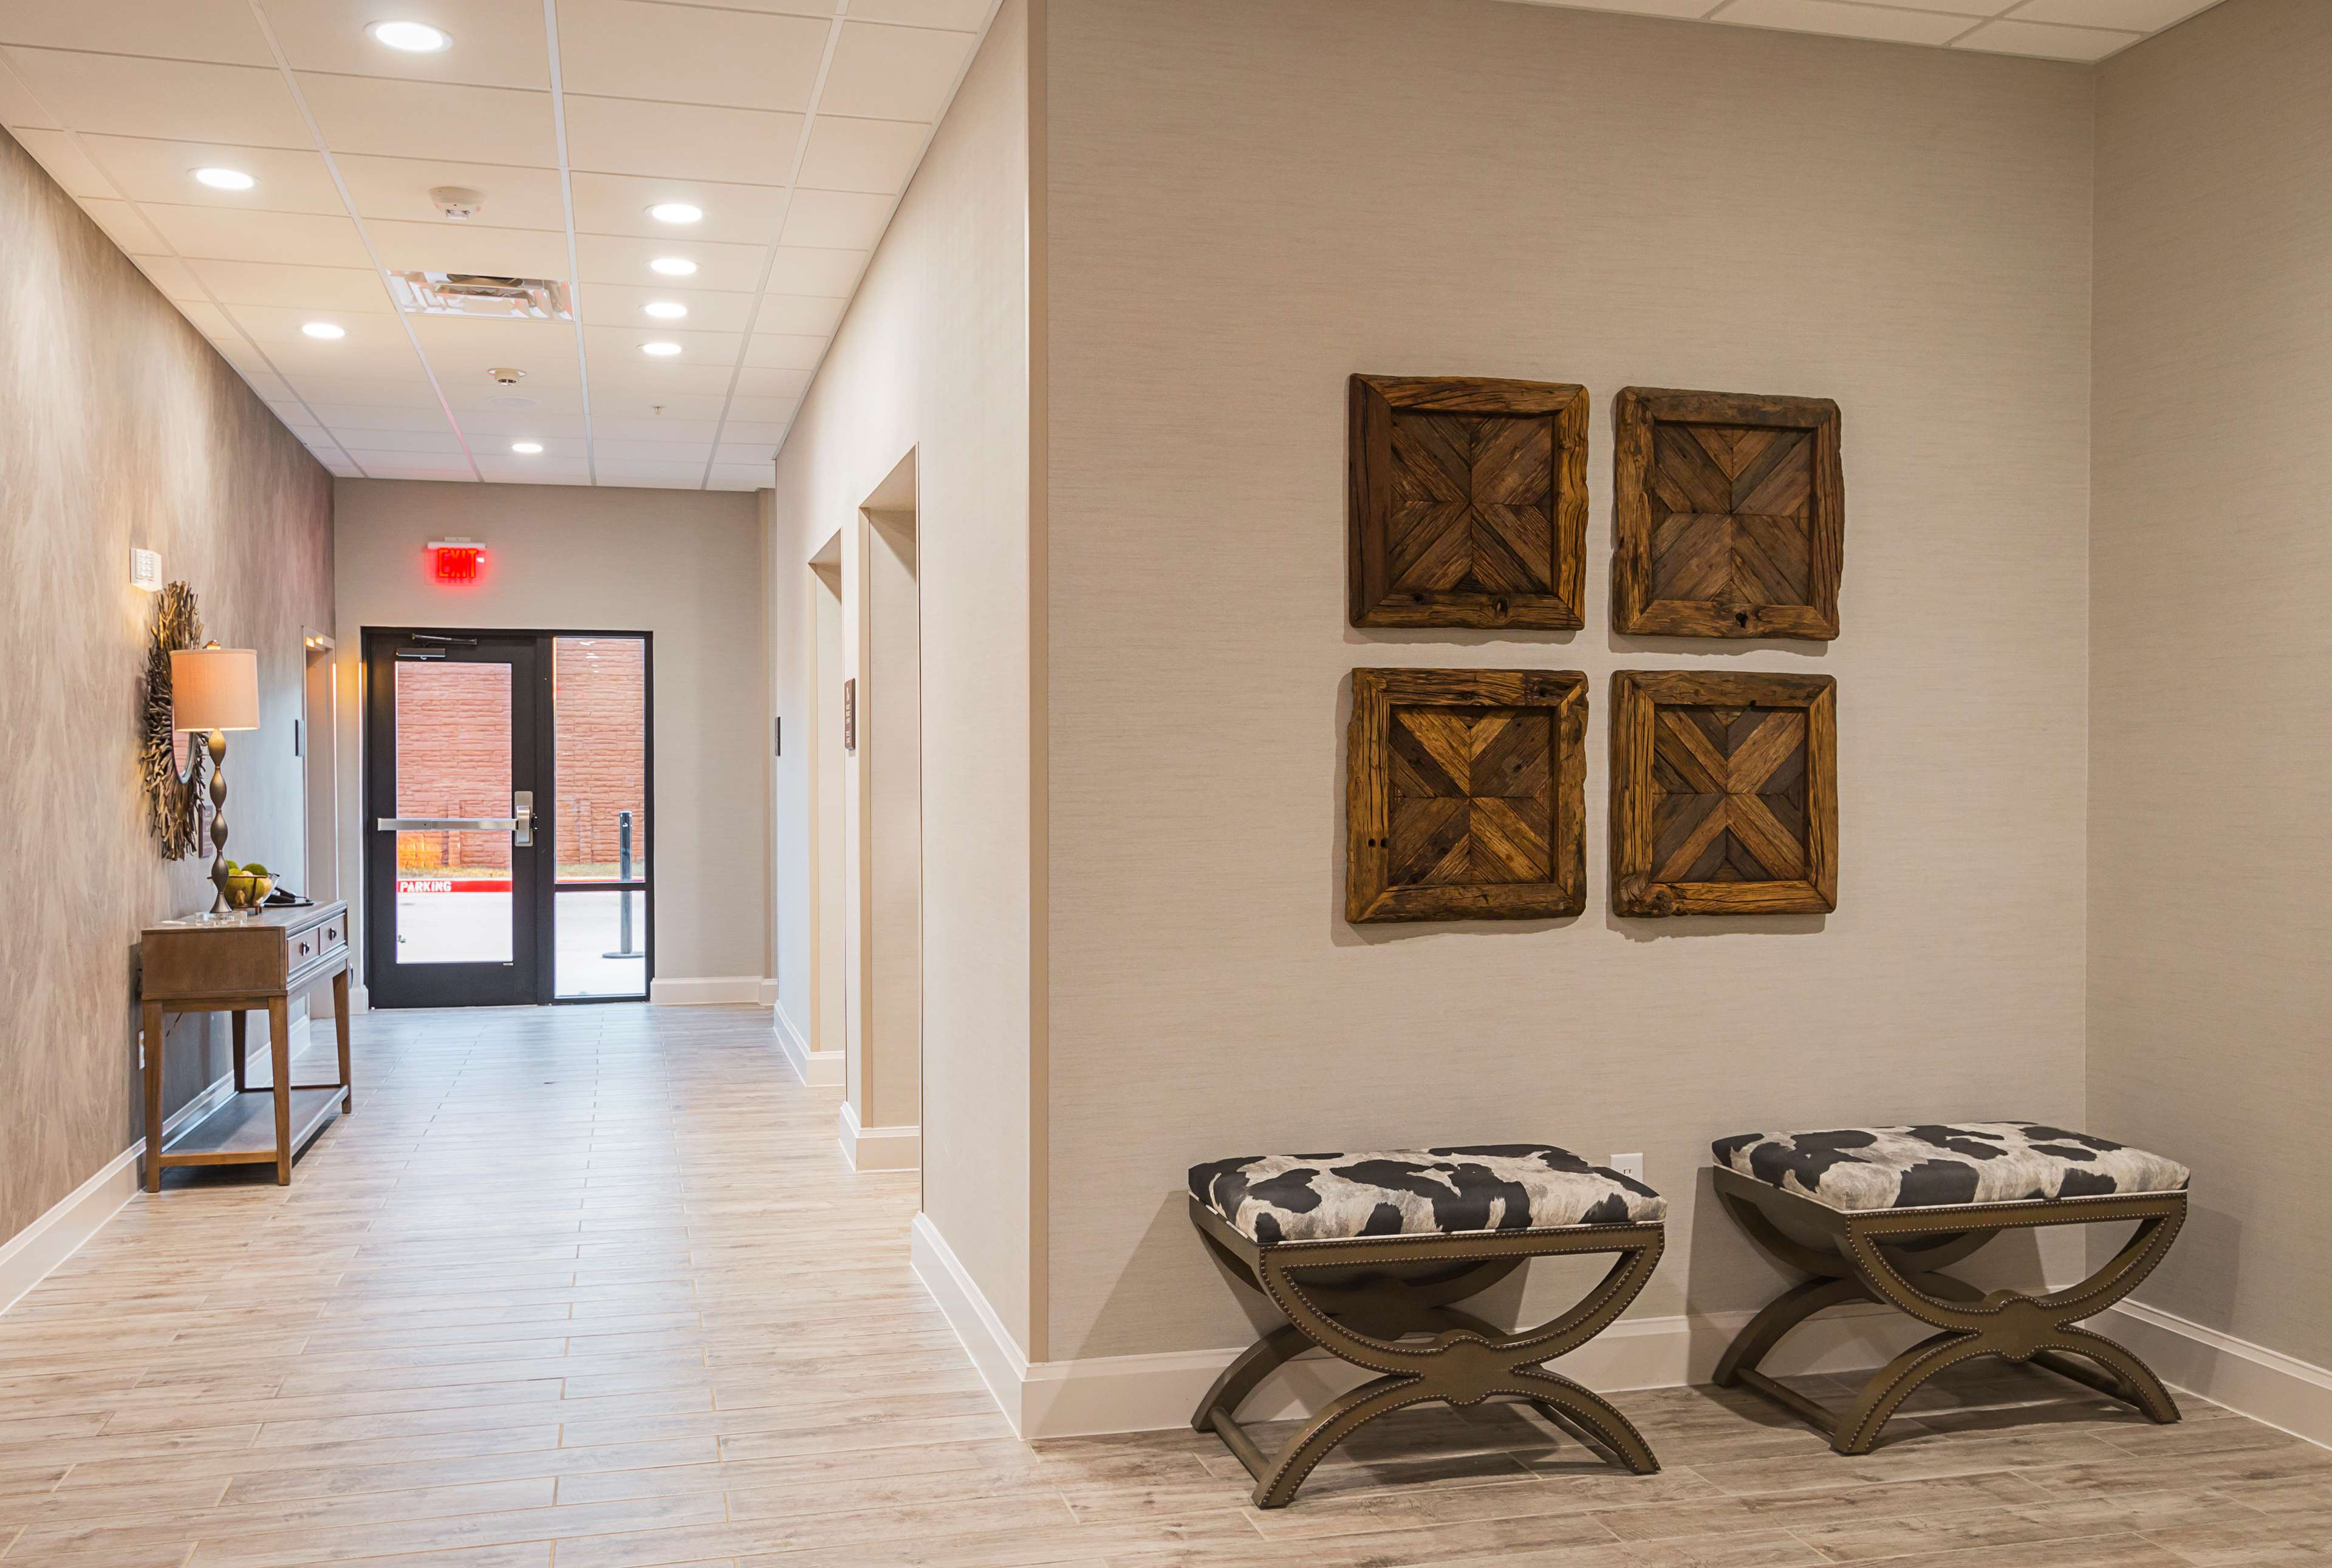 Hampton Inn & Suites Colleyville DFW West image 3